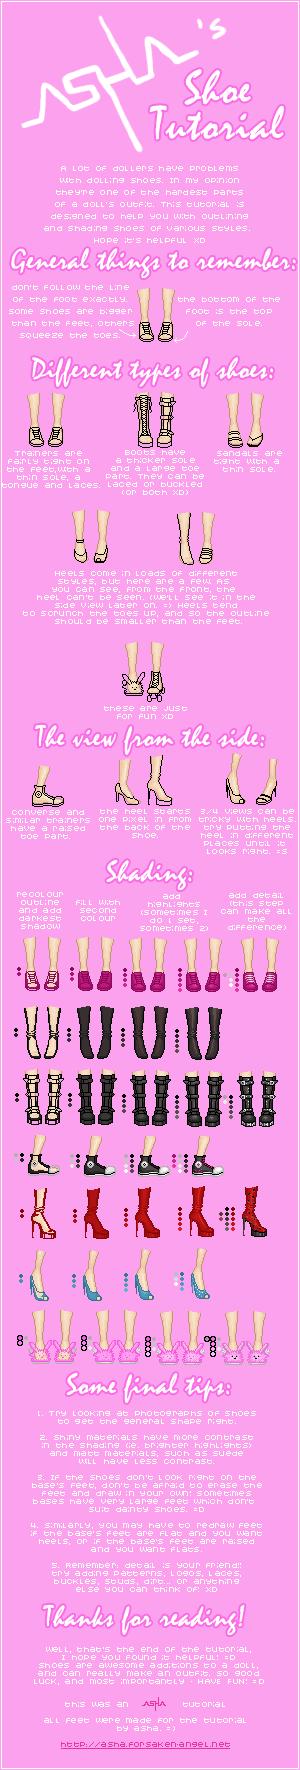 Asha's Shoe Tutorial by Icecradle